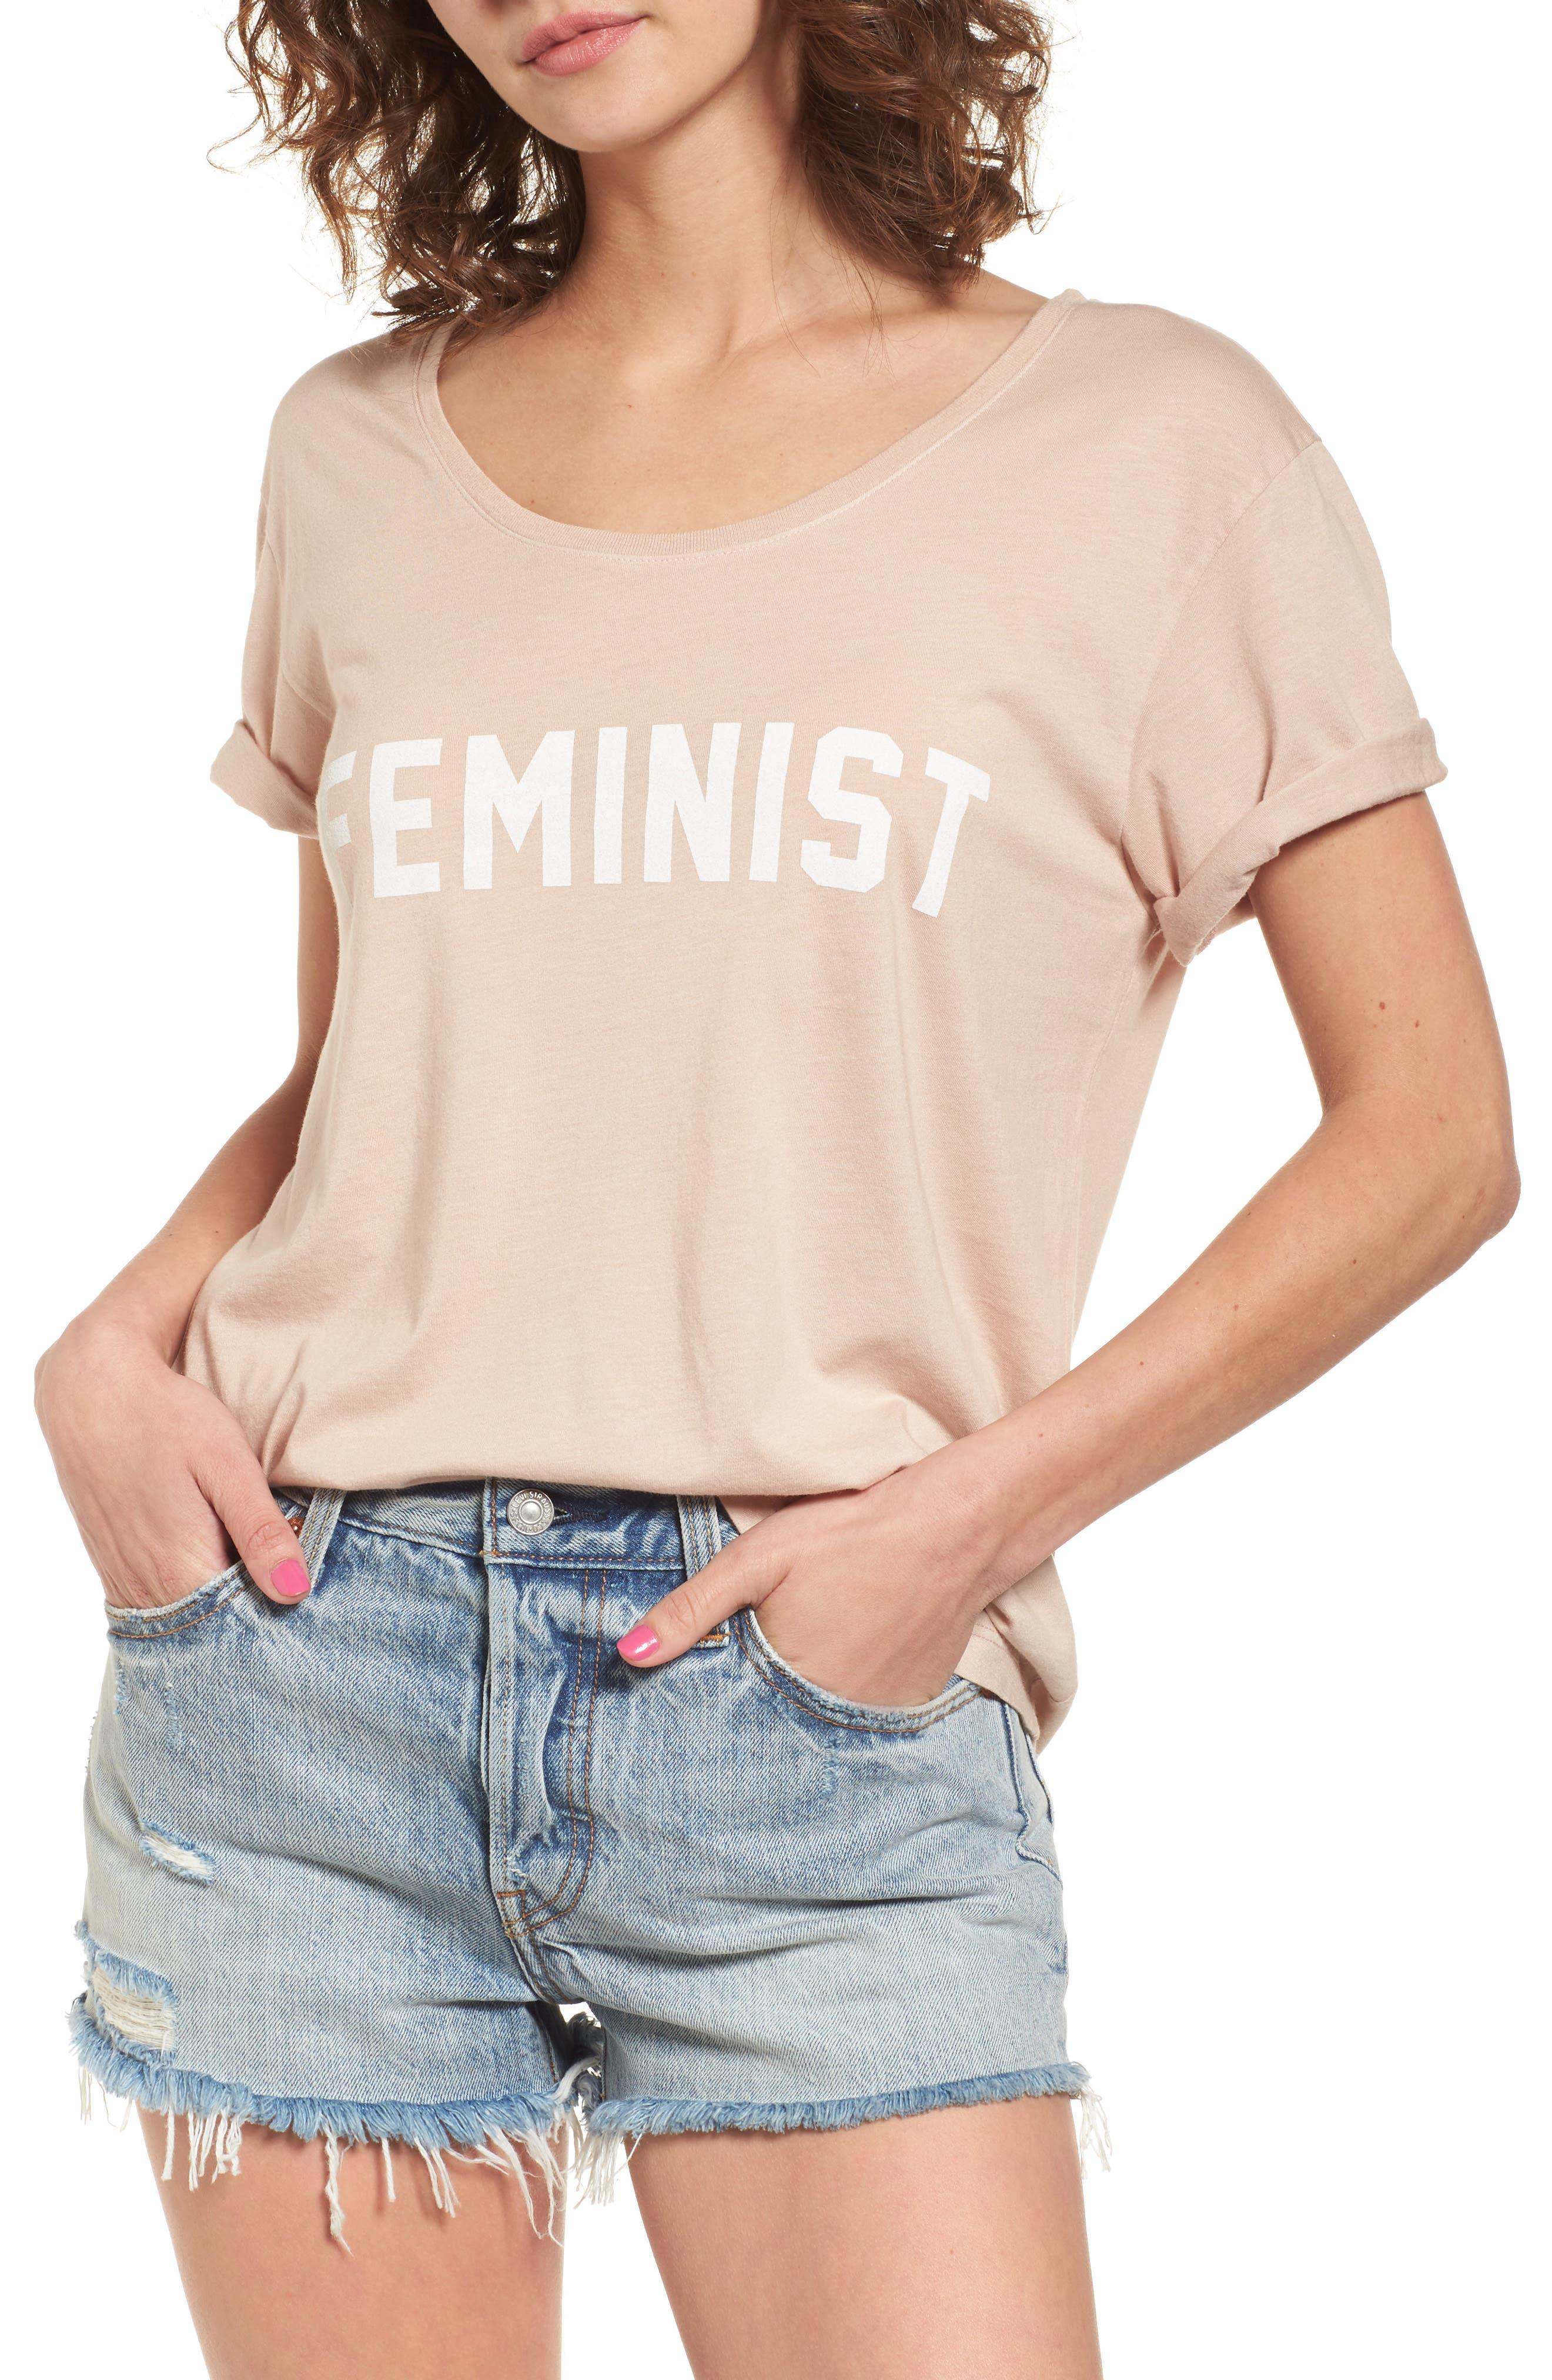 Feminist Graphic Tee,                         Main,                         color, 250